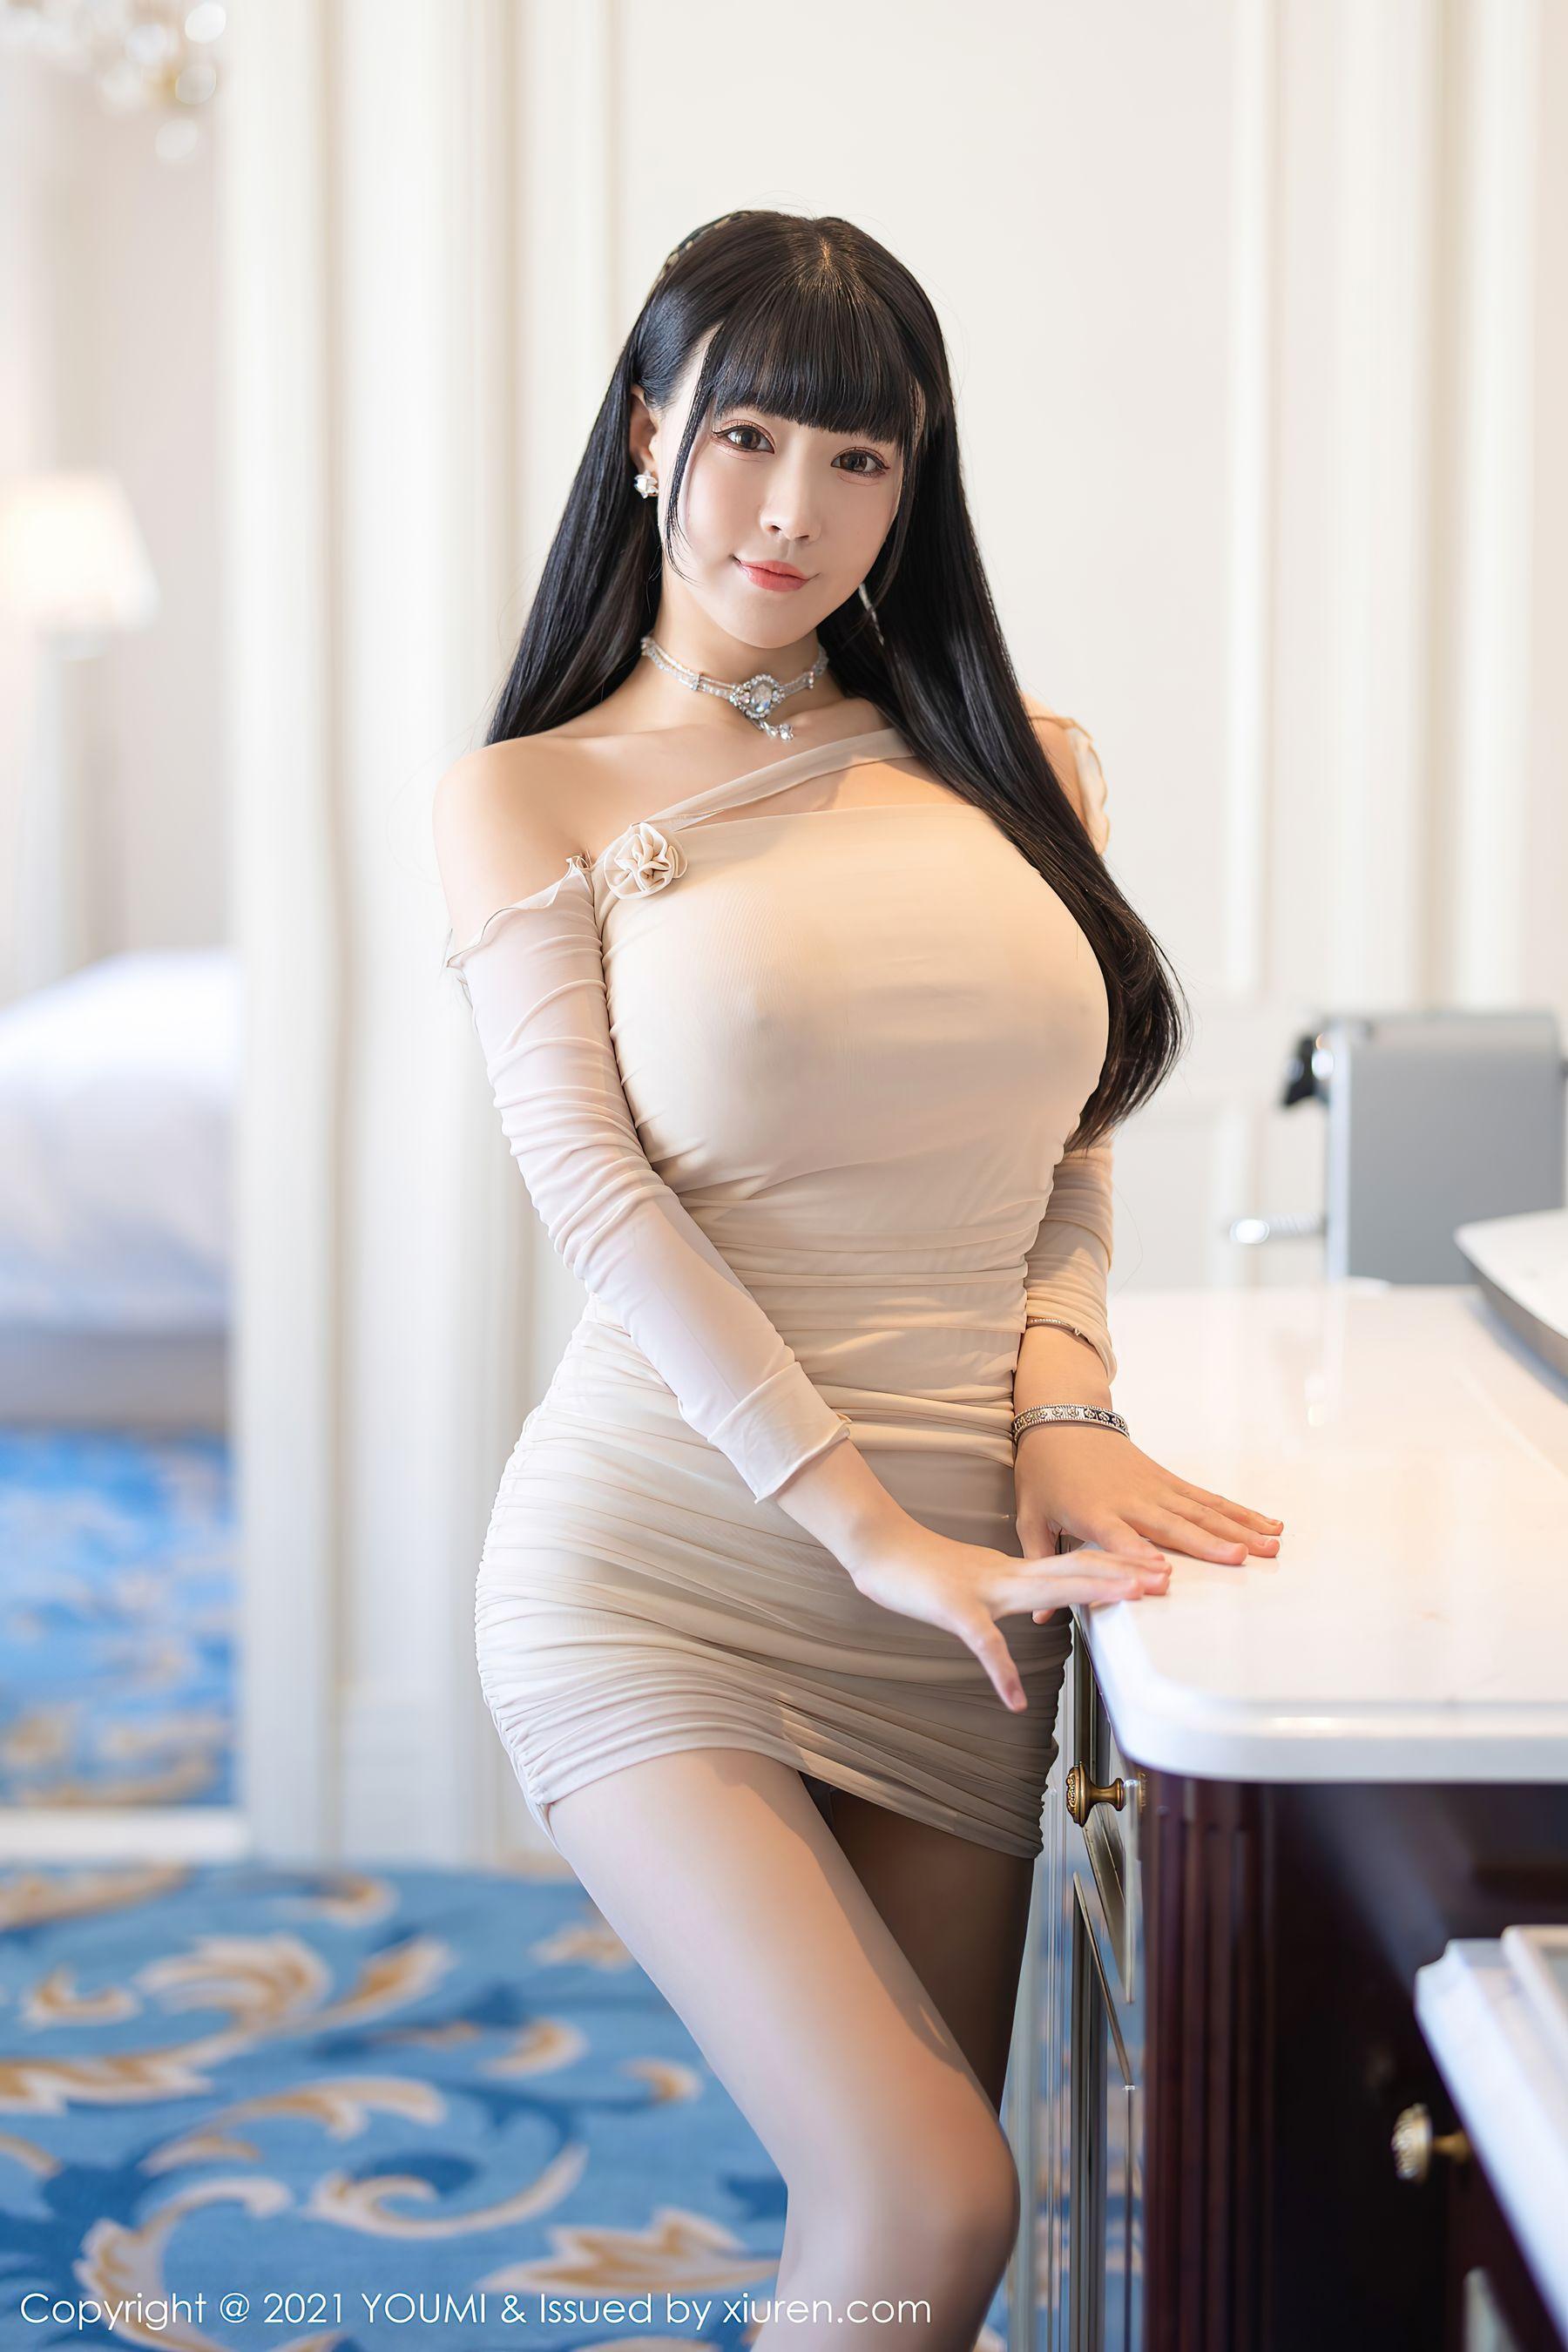 VOL.654 [尤蜜荟]巨乳肥臀:朱可儿(Barbie可儿,Flower朱可儿)超高清写真套图(104P)